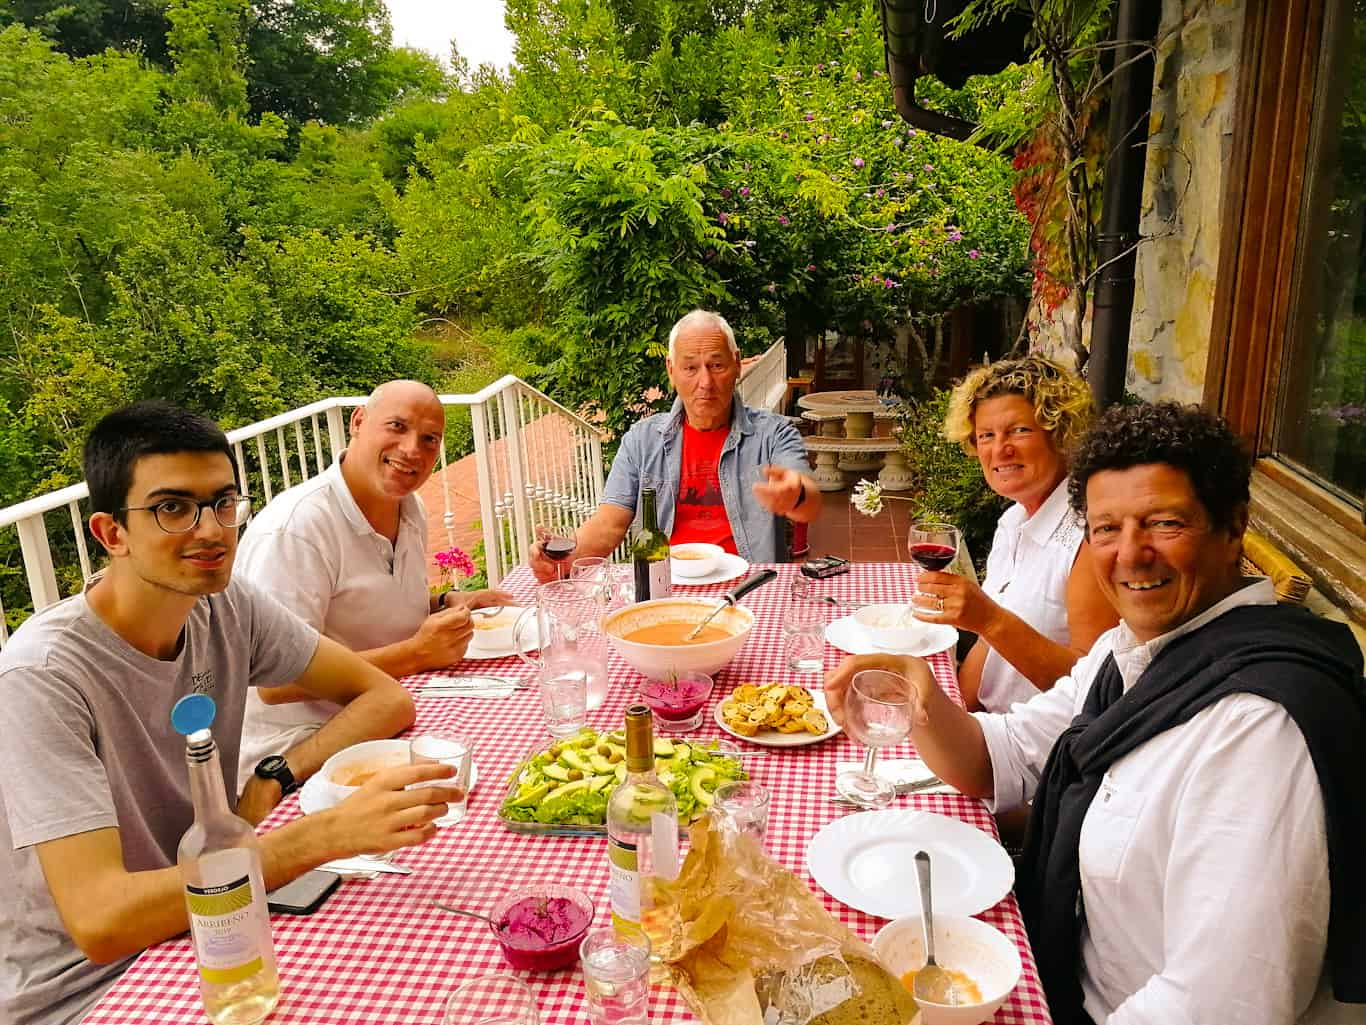 Spanish Dinner party in Navarre